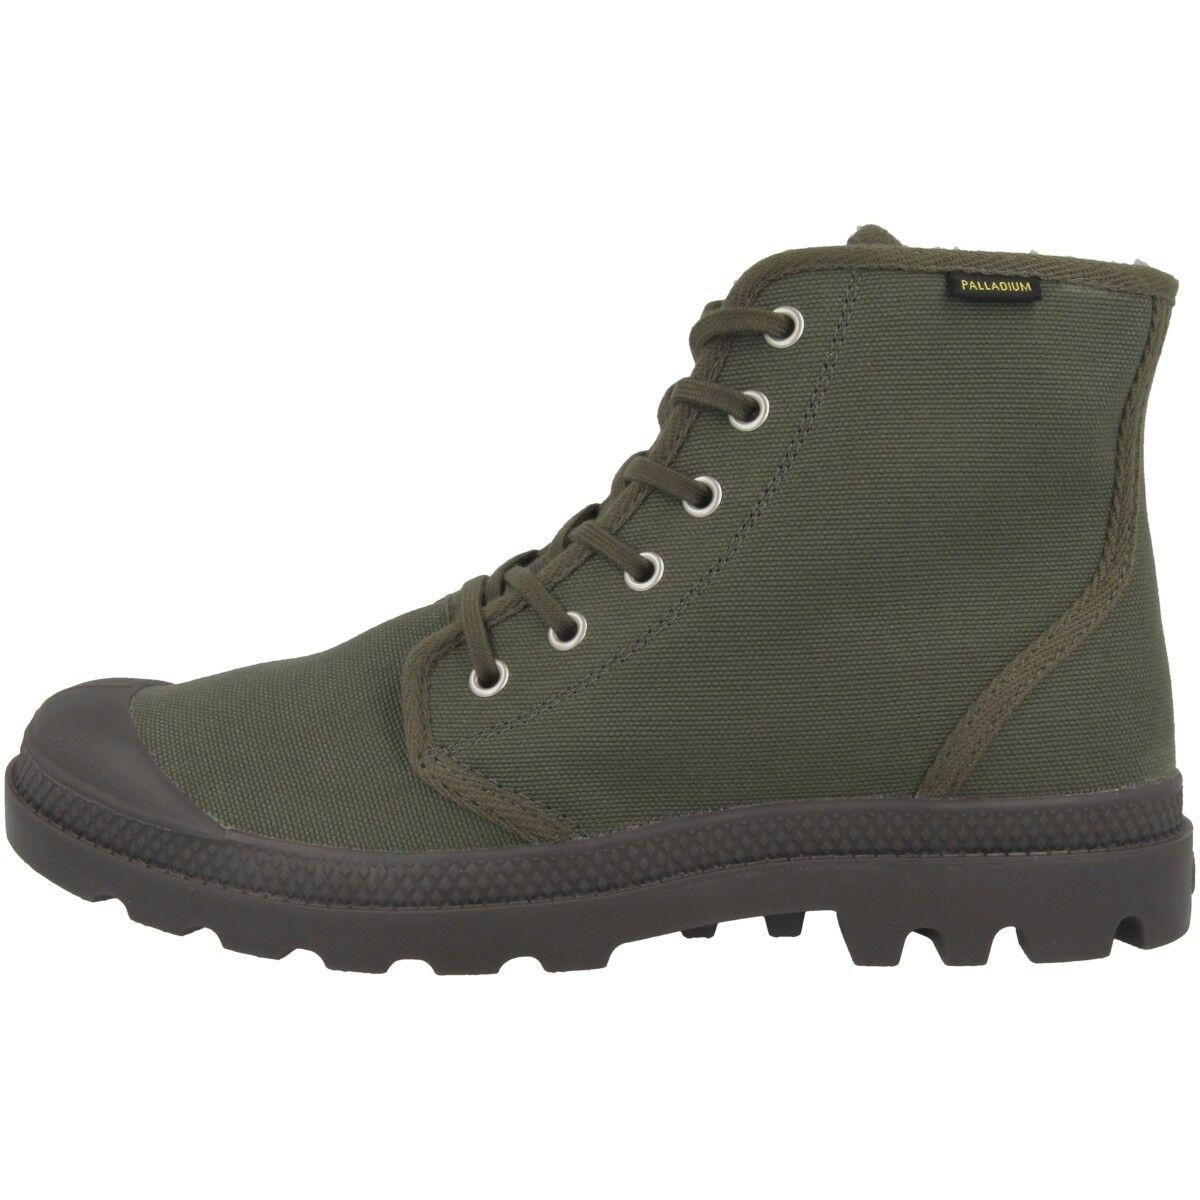 Palladium devoir Hi originaux bottes chaussures High Top Turnchaussures Unisexe 75349-326